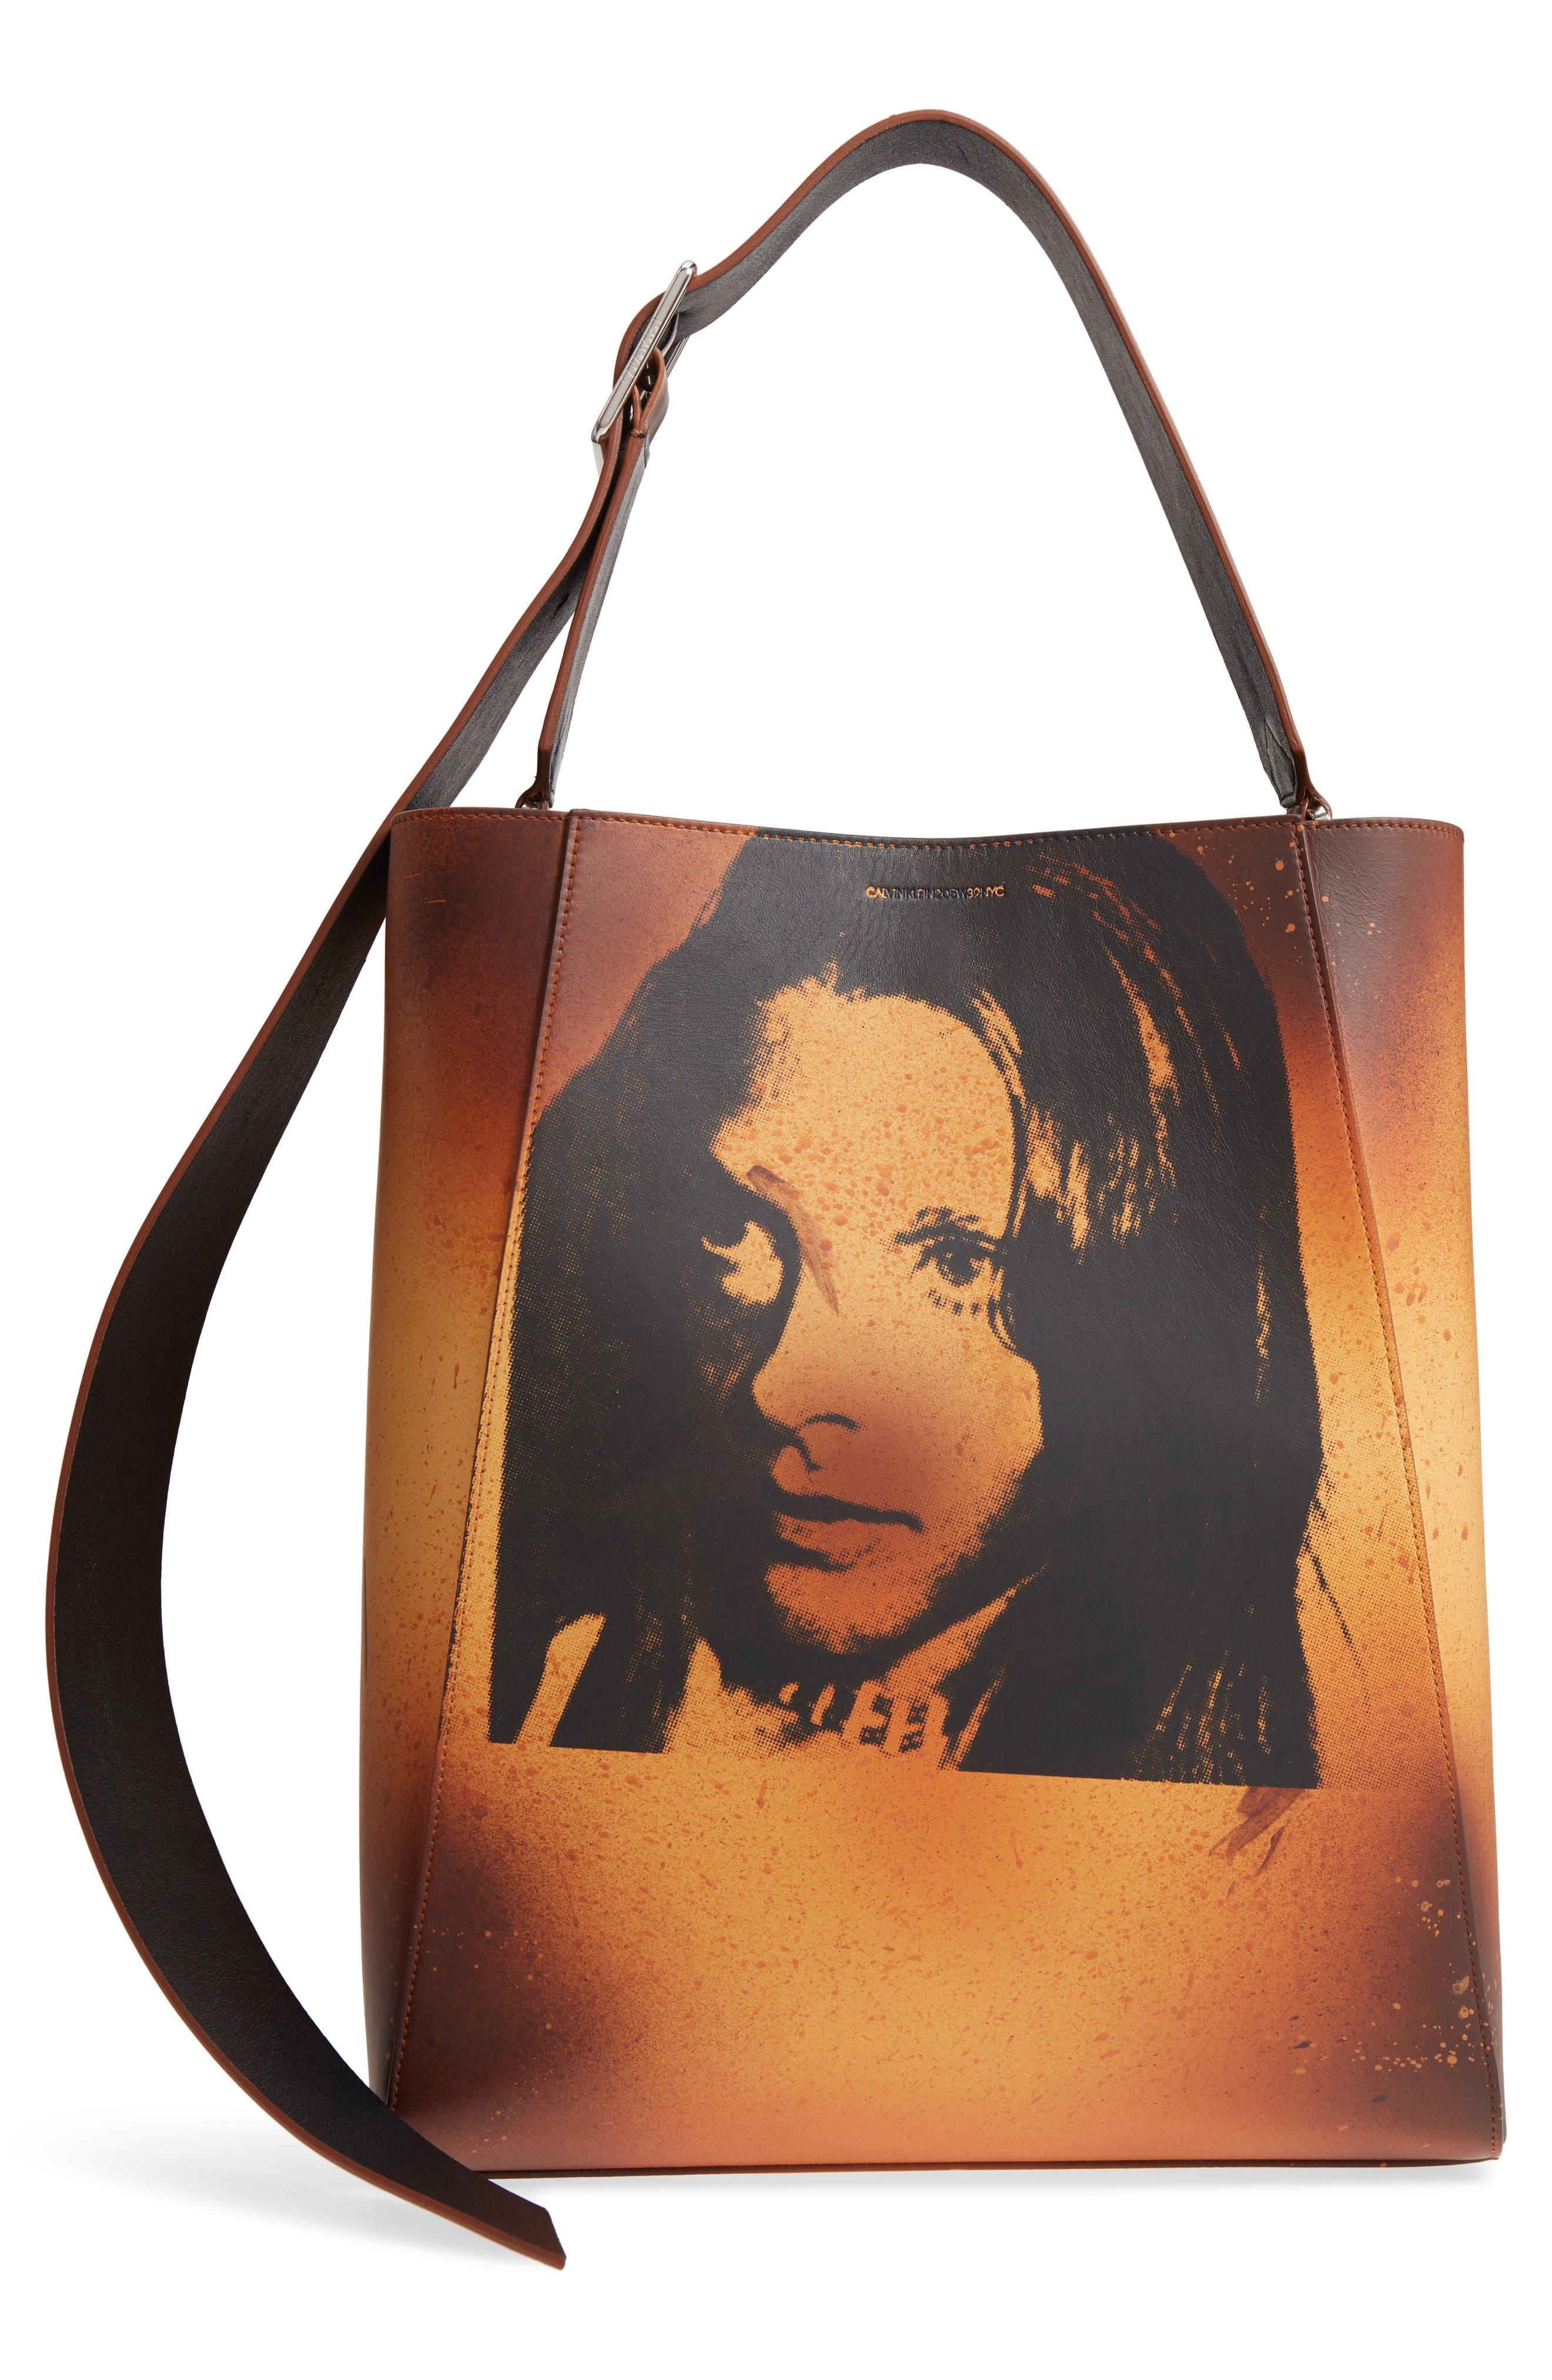 x Andy Warhol Foundation Sandra Brant Calfskin Leather Bucket Bag,                             Main thumbnail 1, color,                             AMBER/ BLACK